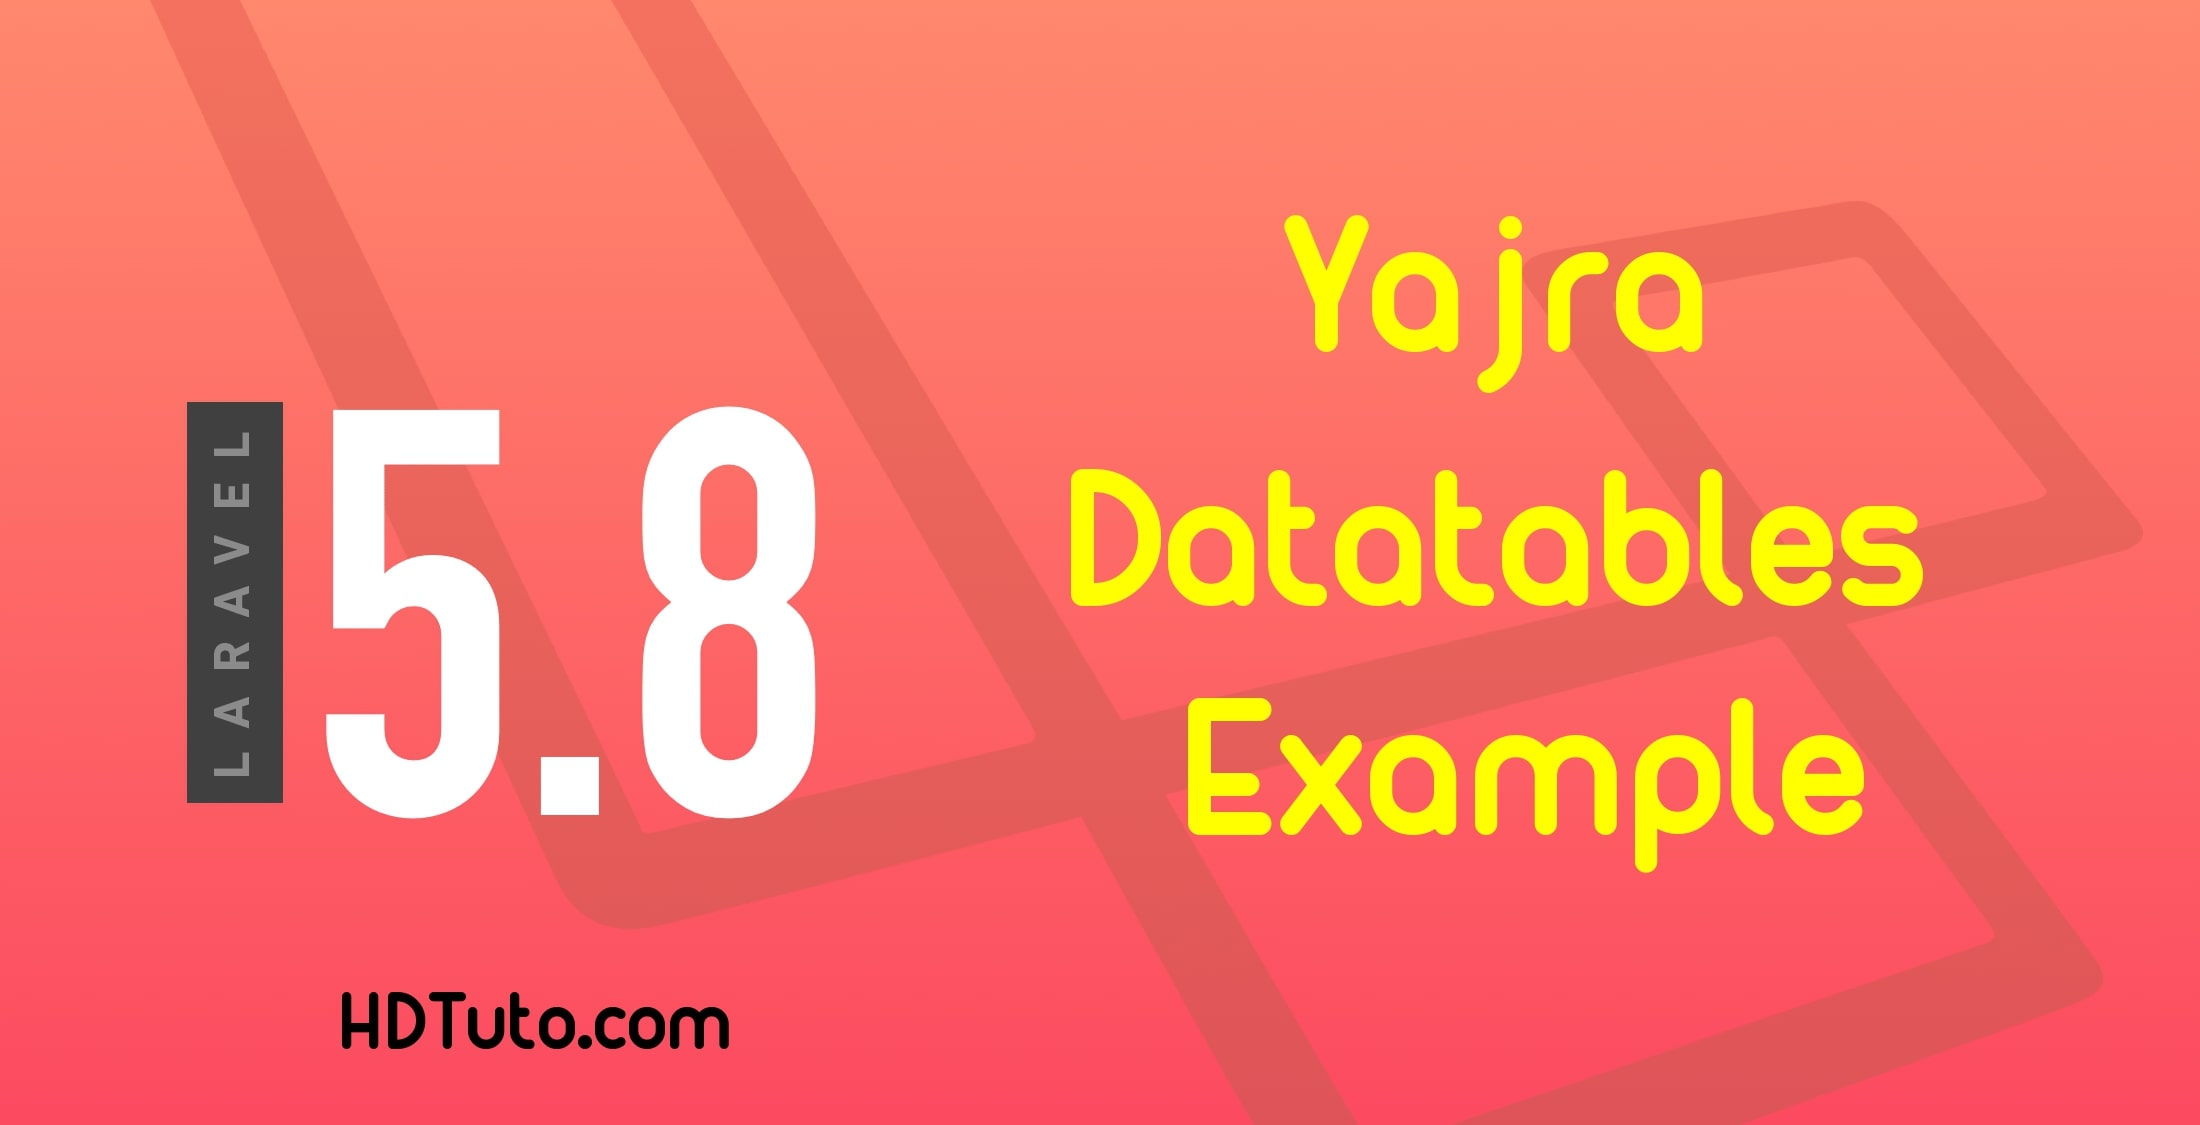 Yajra Datatables Laravel 5 8 Example - HDTuto com